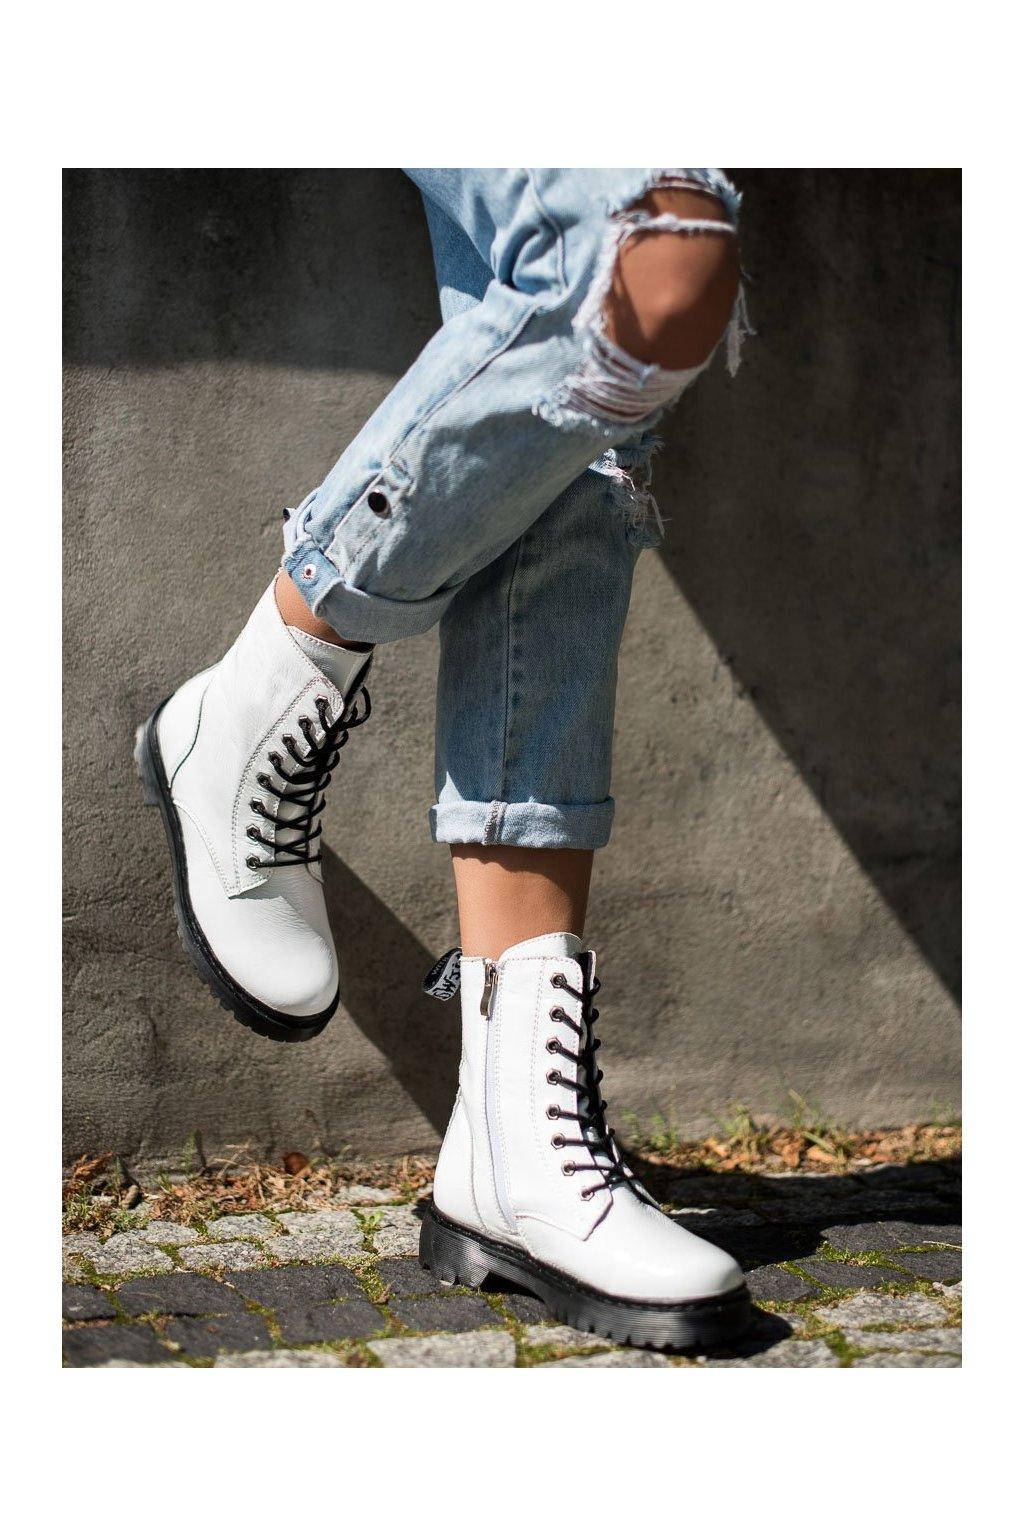 Biele dámske topánky Vinceza kod SG21-7787W